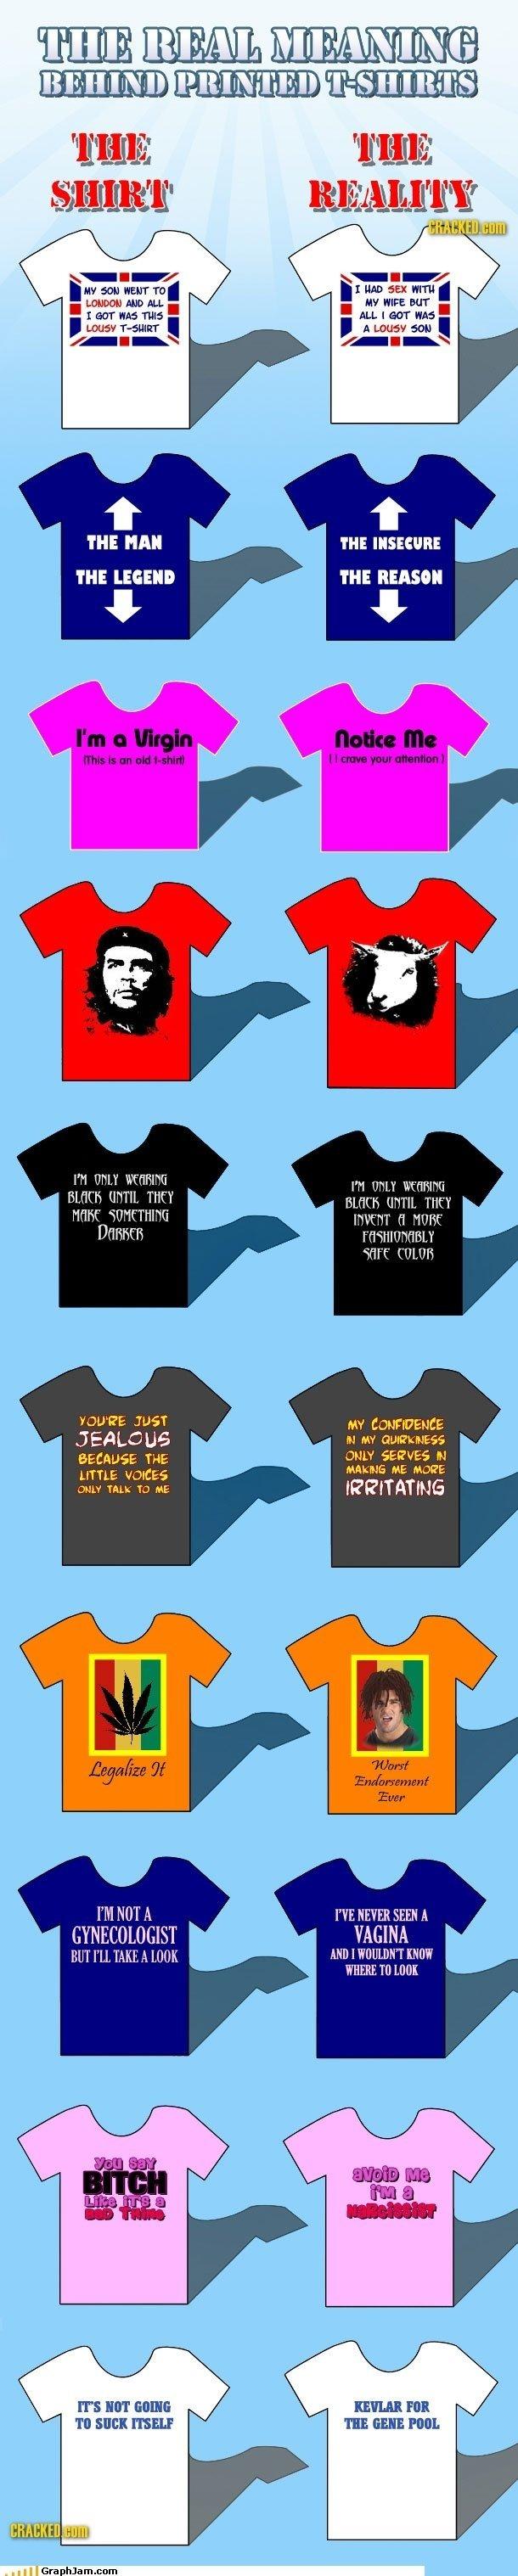 T Shirt Meaning. hi. tittel tilight', l. ' ilt I I ear was 114:: I tfor. ifinllt JUST ESE Eh WEE THE LITTLE GNI TALE TC.' Tilt PM NUT A GYNECOLOGIST IT' S INT T